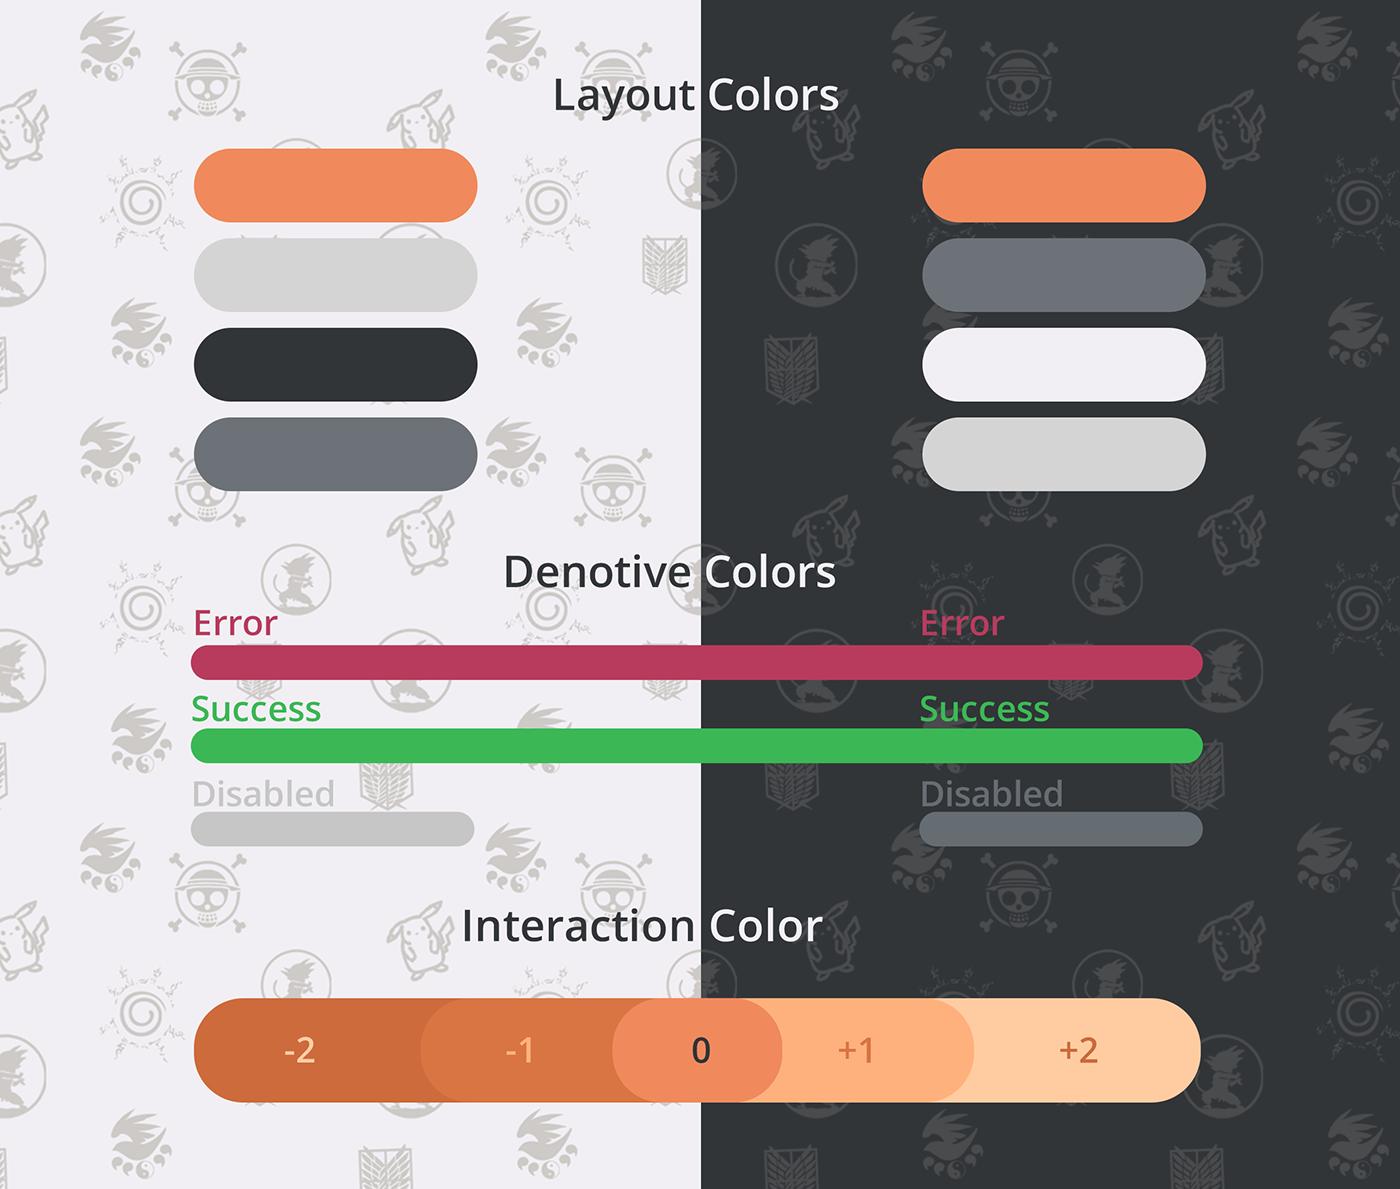 uiux Mobile app anime ILLUSTRATION  Adobe XD graphic design  ui ux interaction motion graphics  material